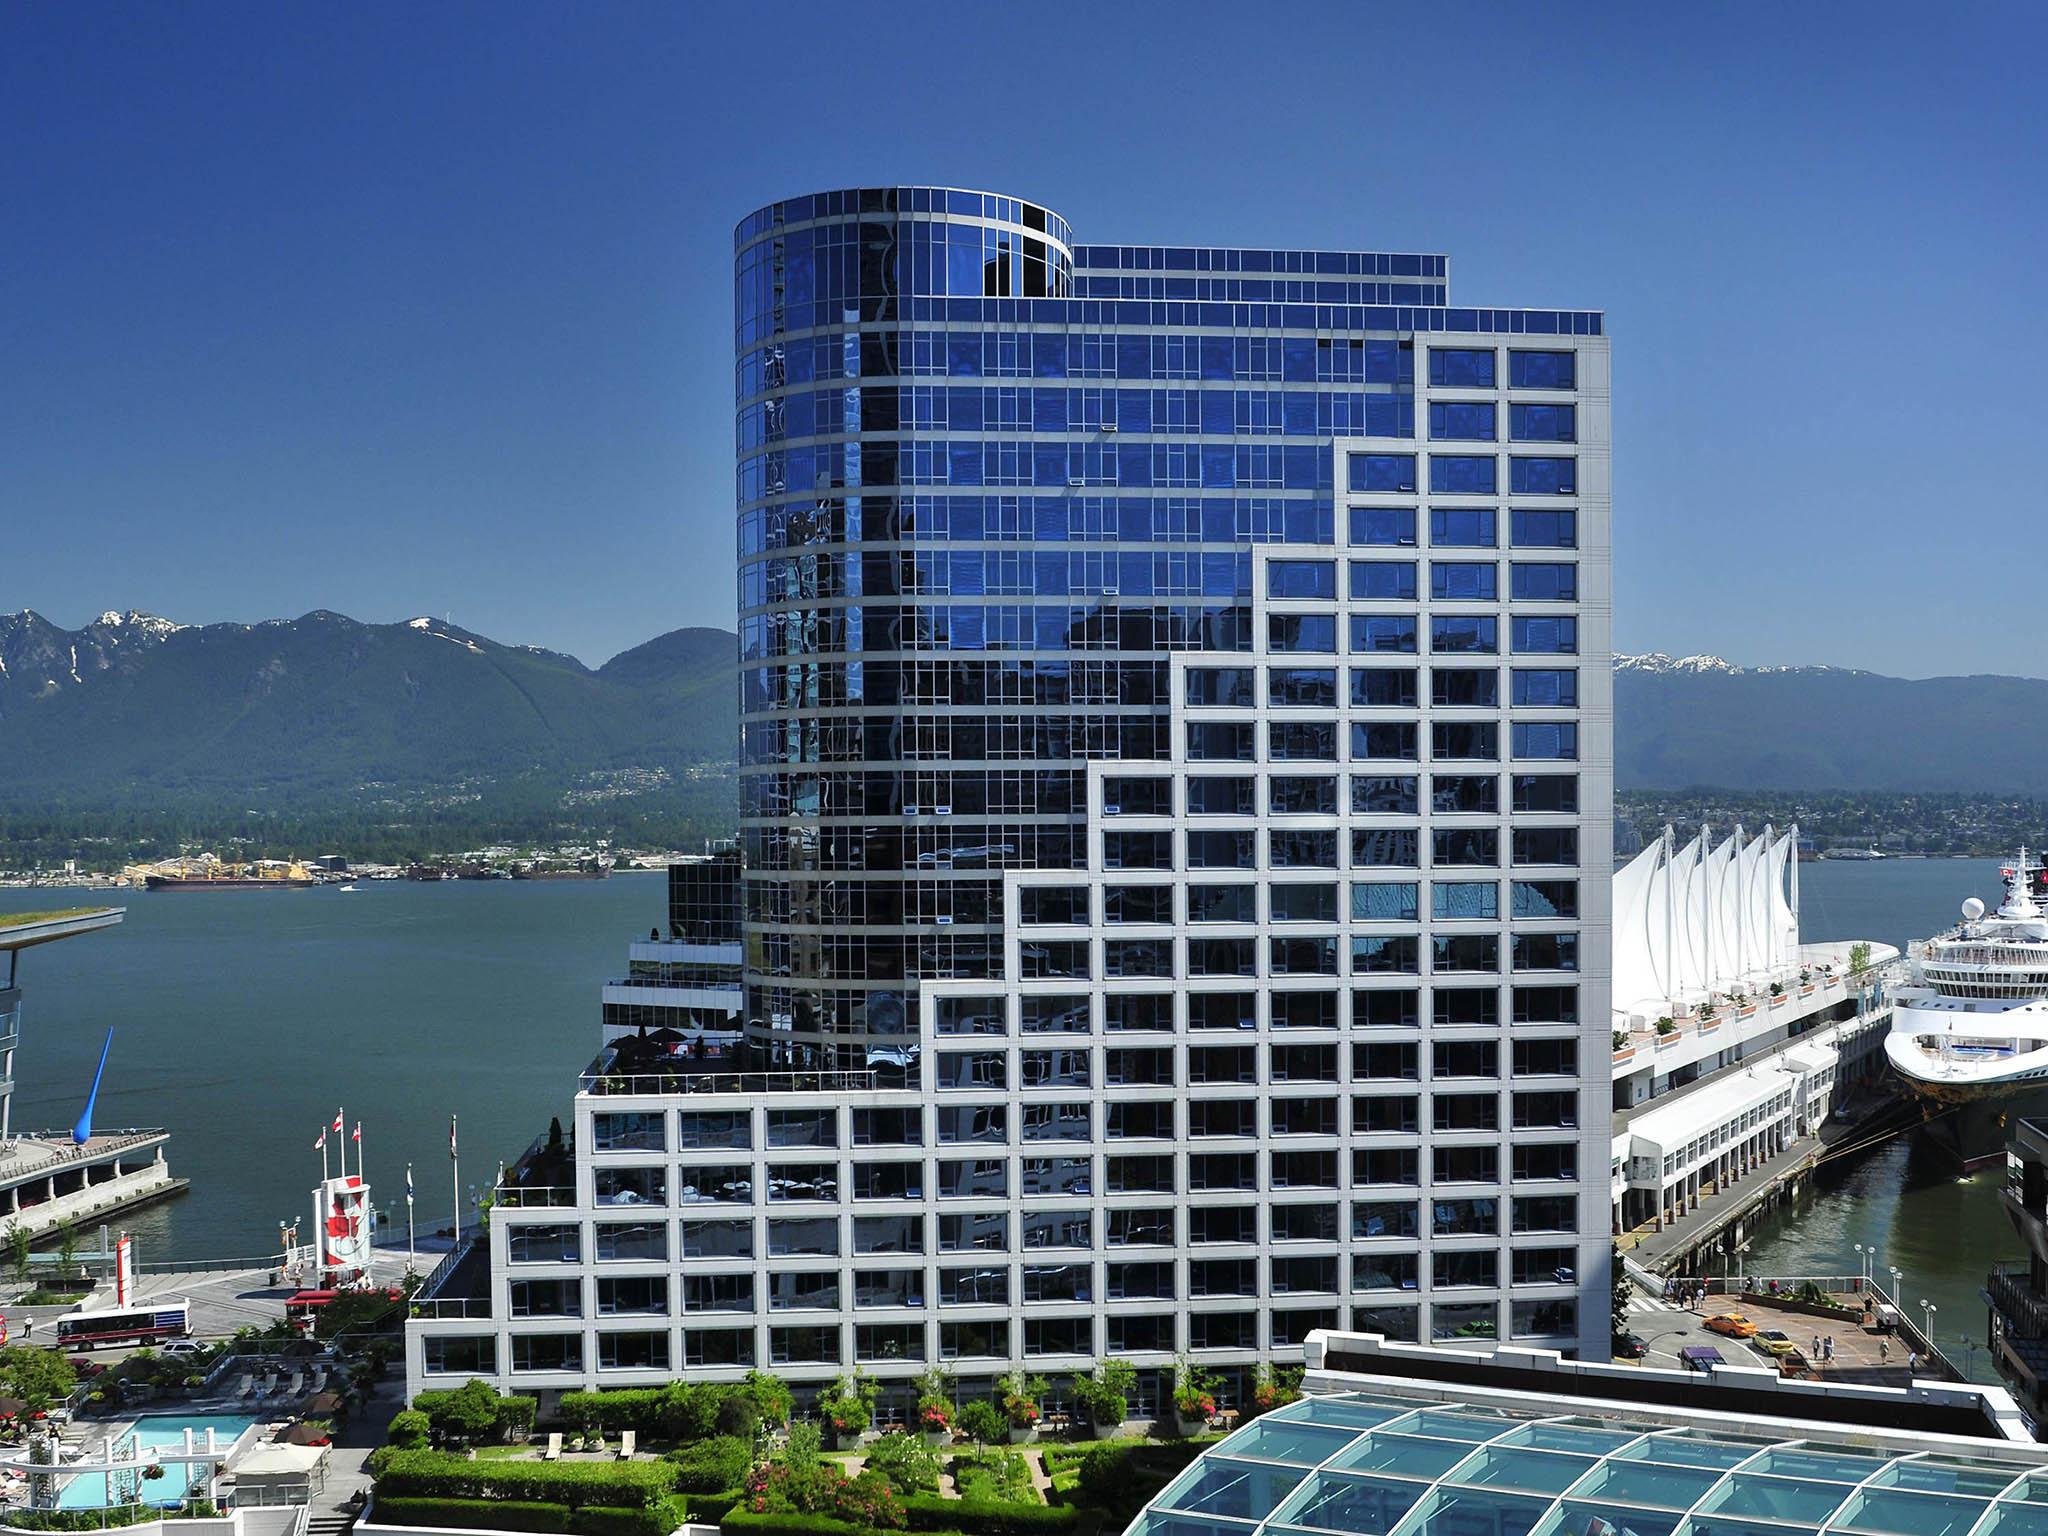 Hotel - Fairmont Waterfront